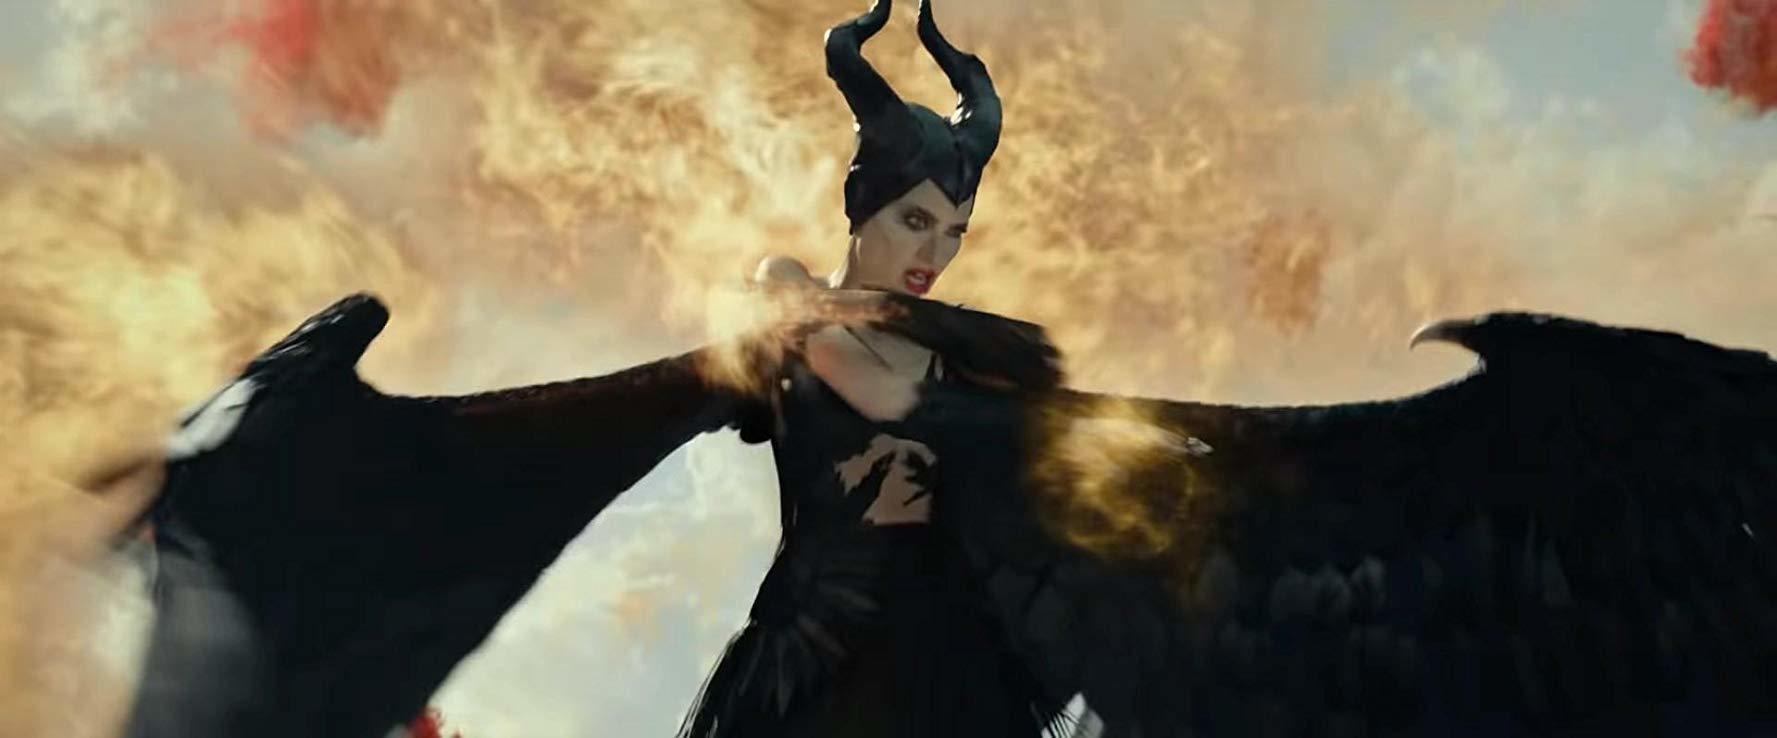 123movies Maleficent Mistress Of Evil Watch Movies 4k 2019 Online English Sub